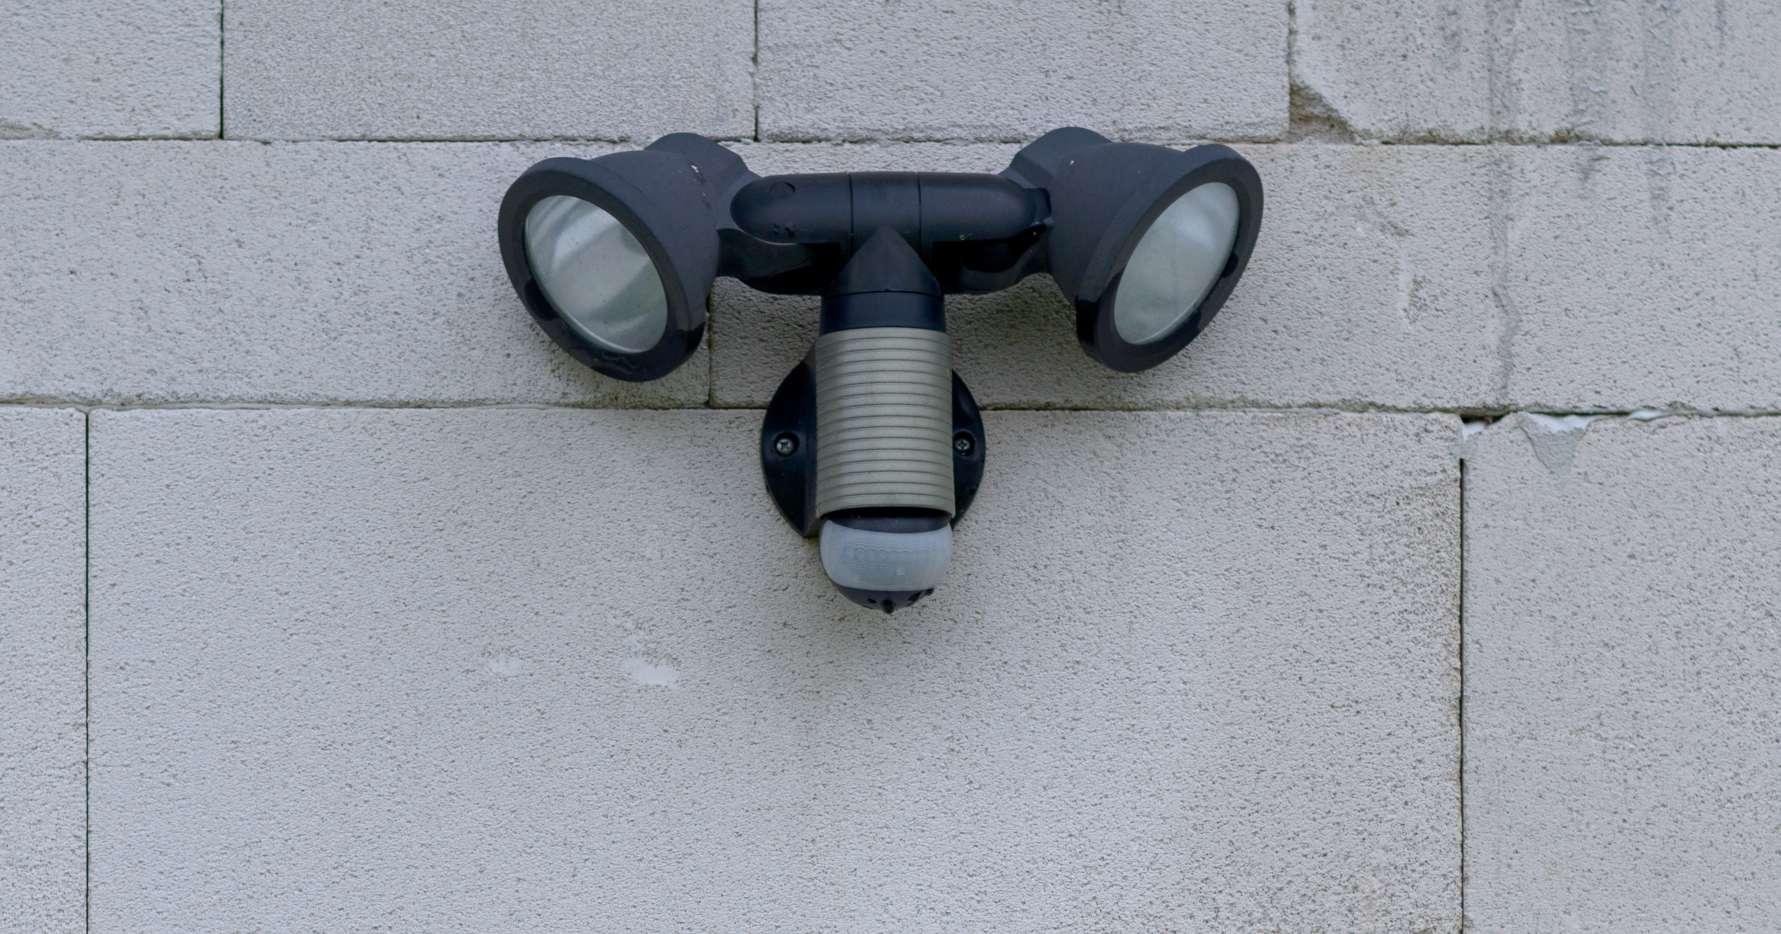 movement detector lights